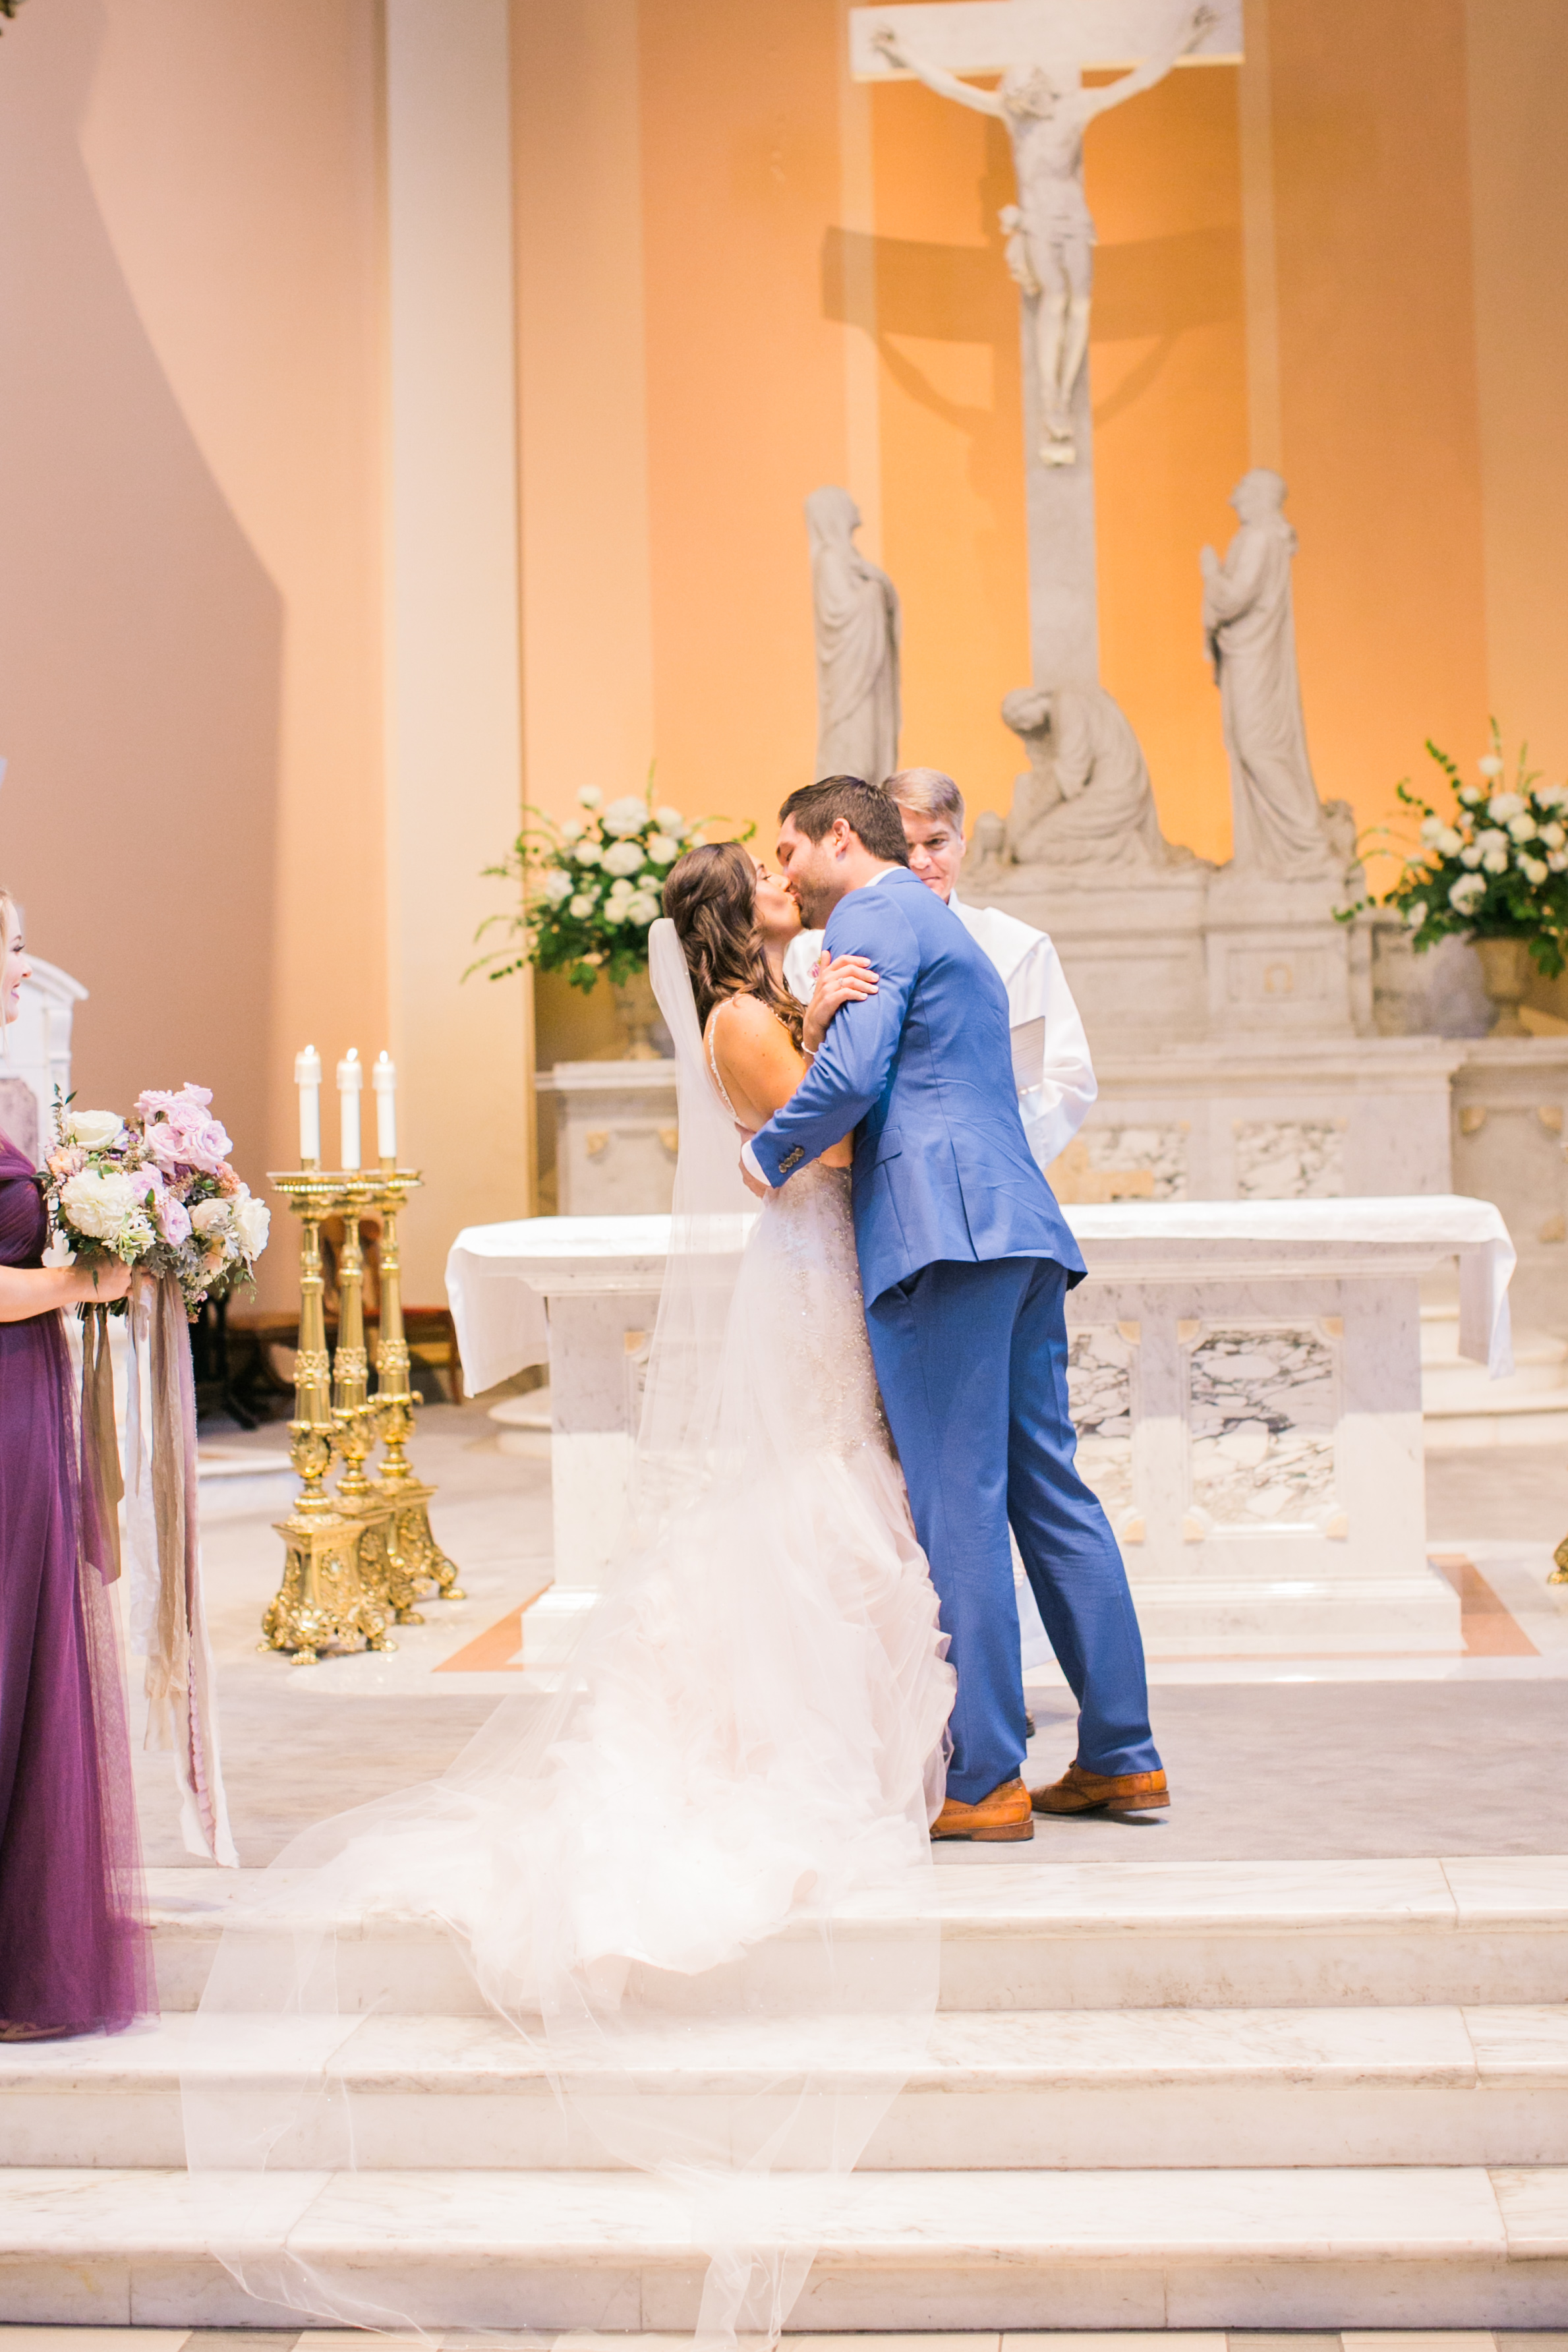 Cathedral of Incarnation - October Wedding - Nashville, TN